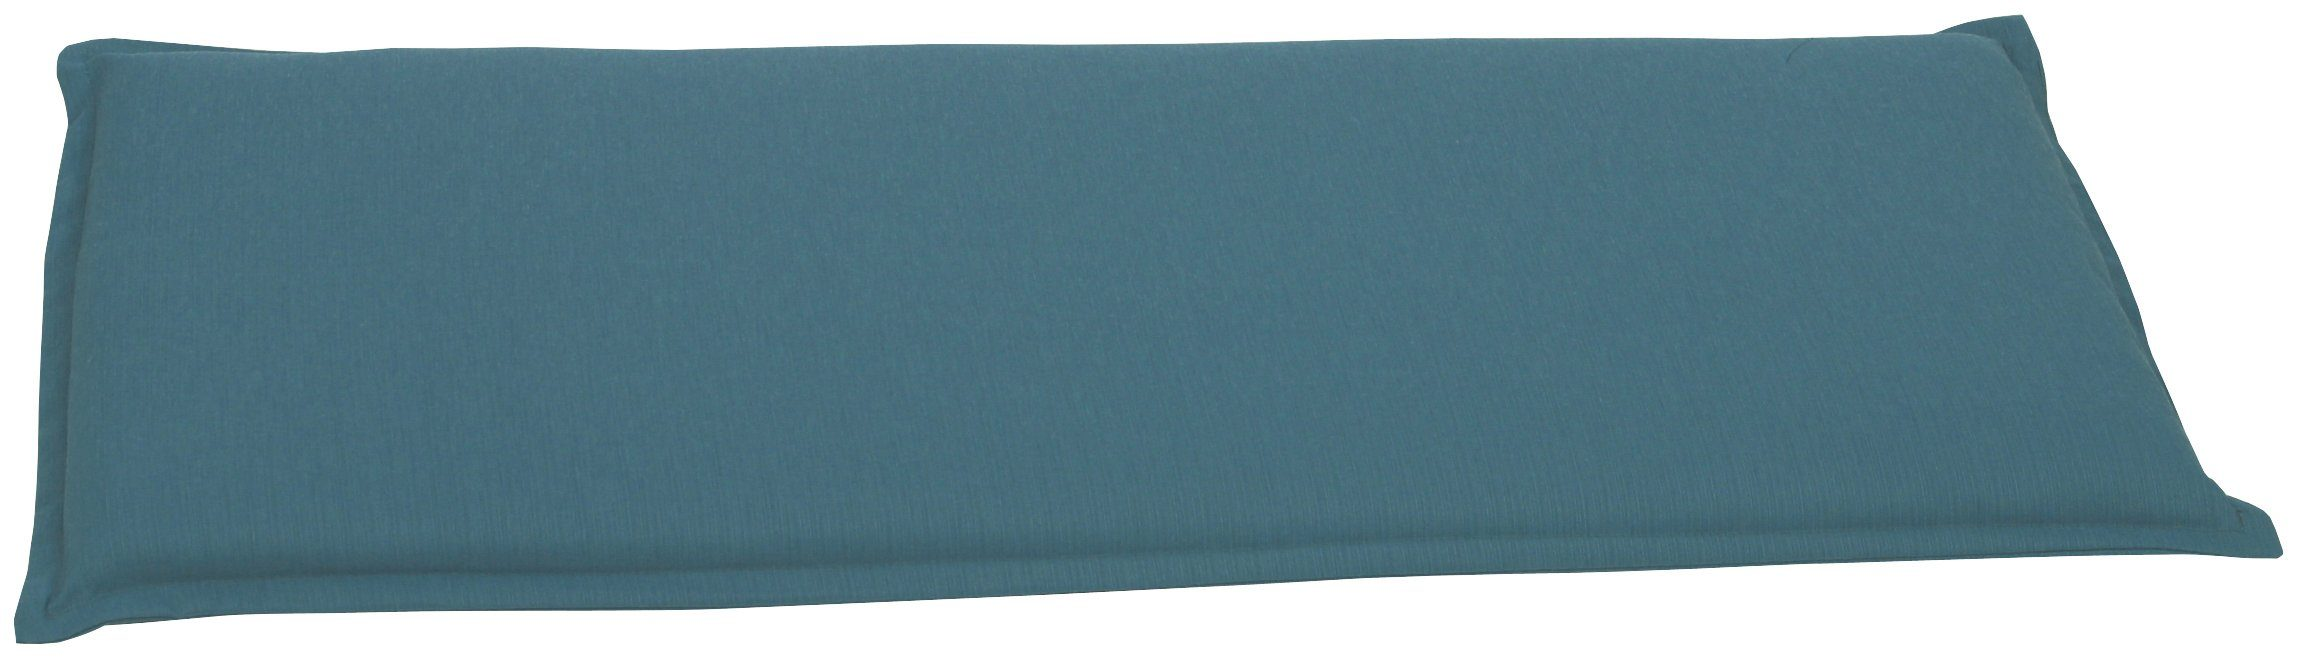 GO-DE Bankauflage , (L/B): ca. 148x45 cm